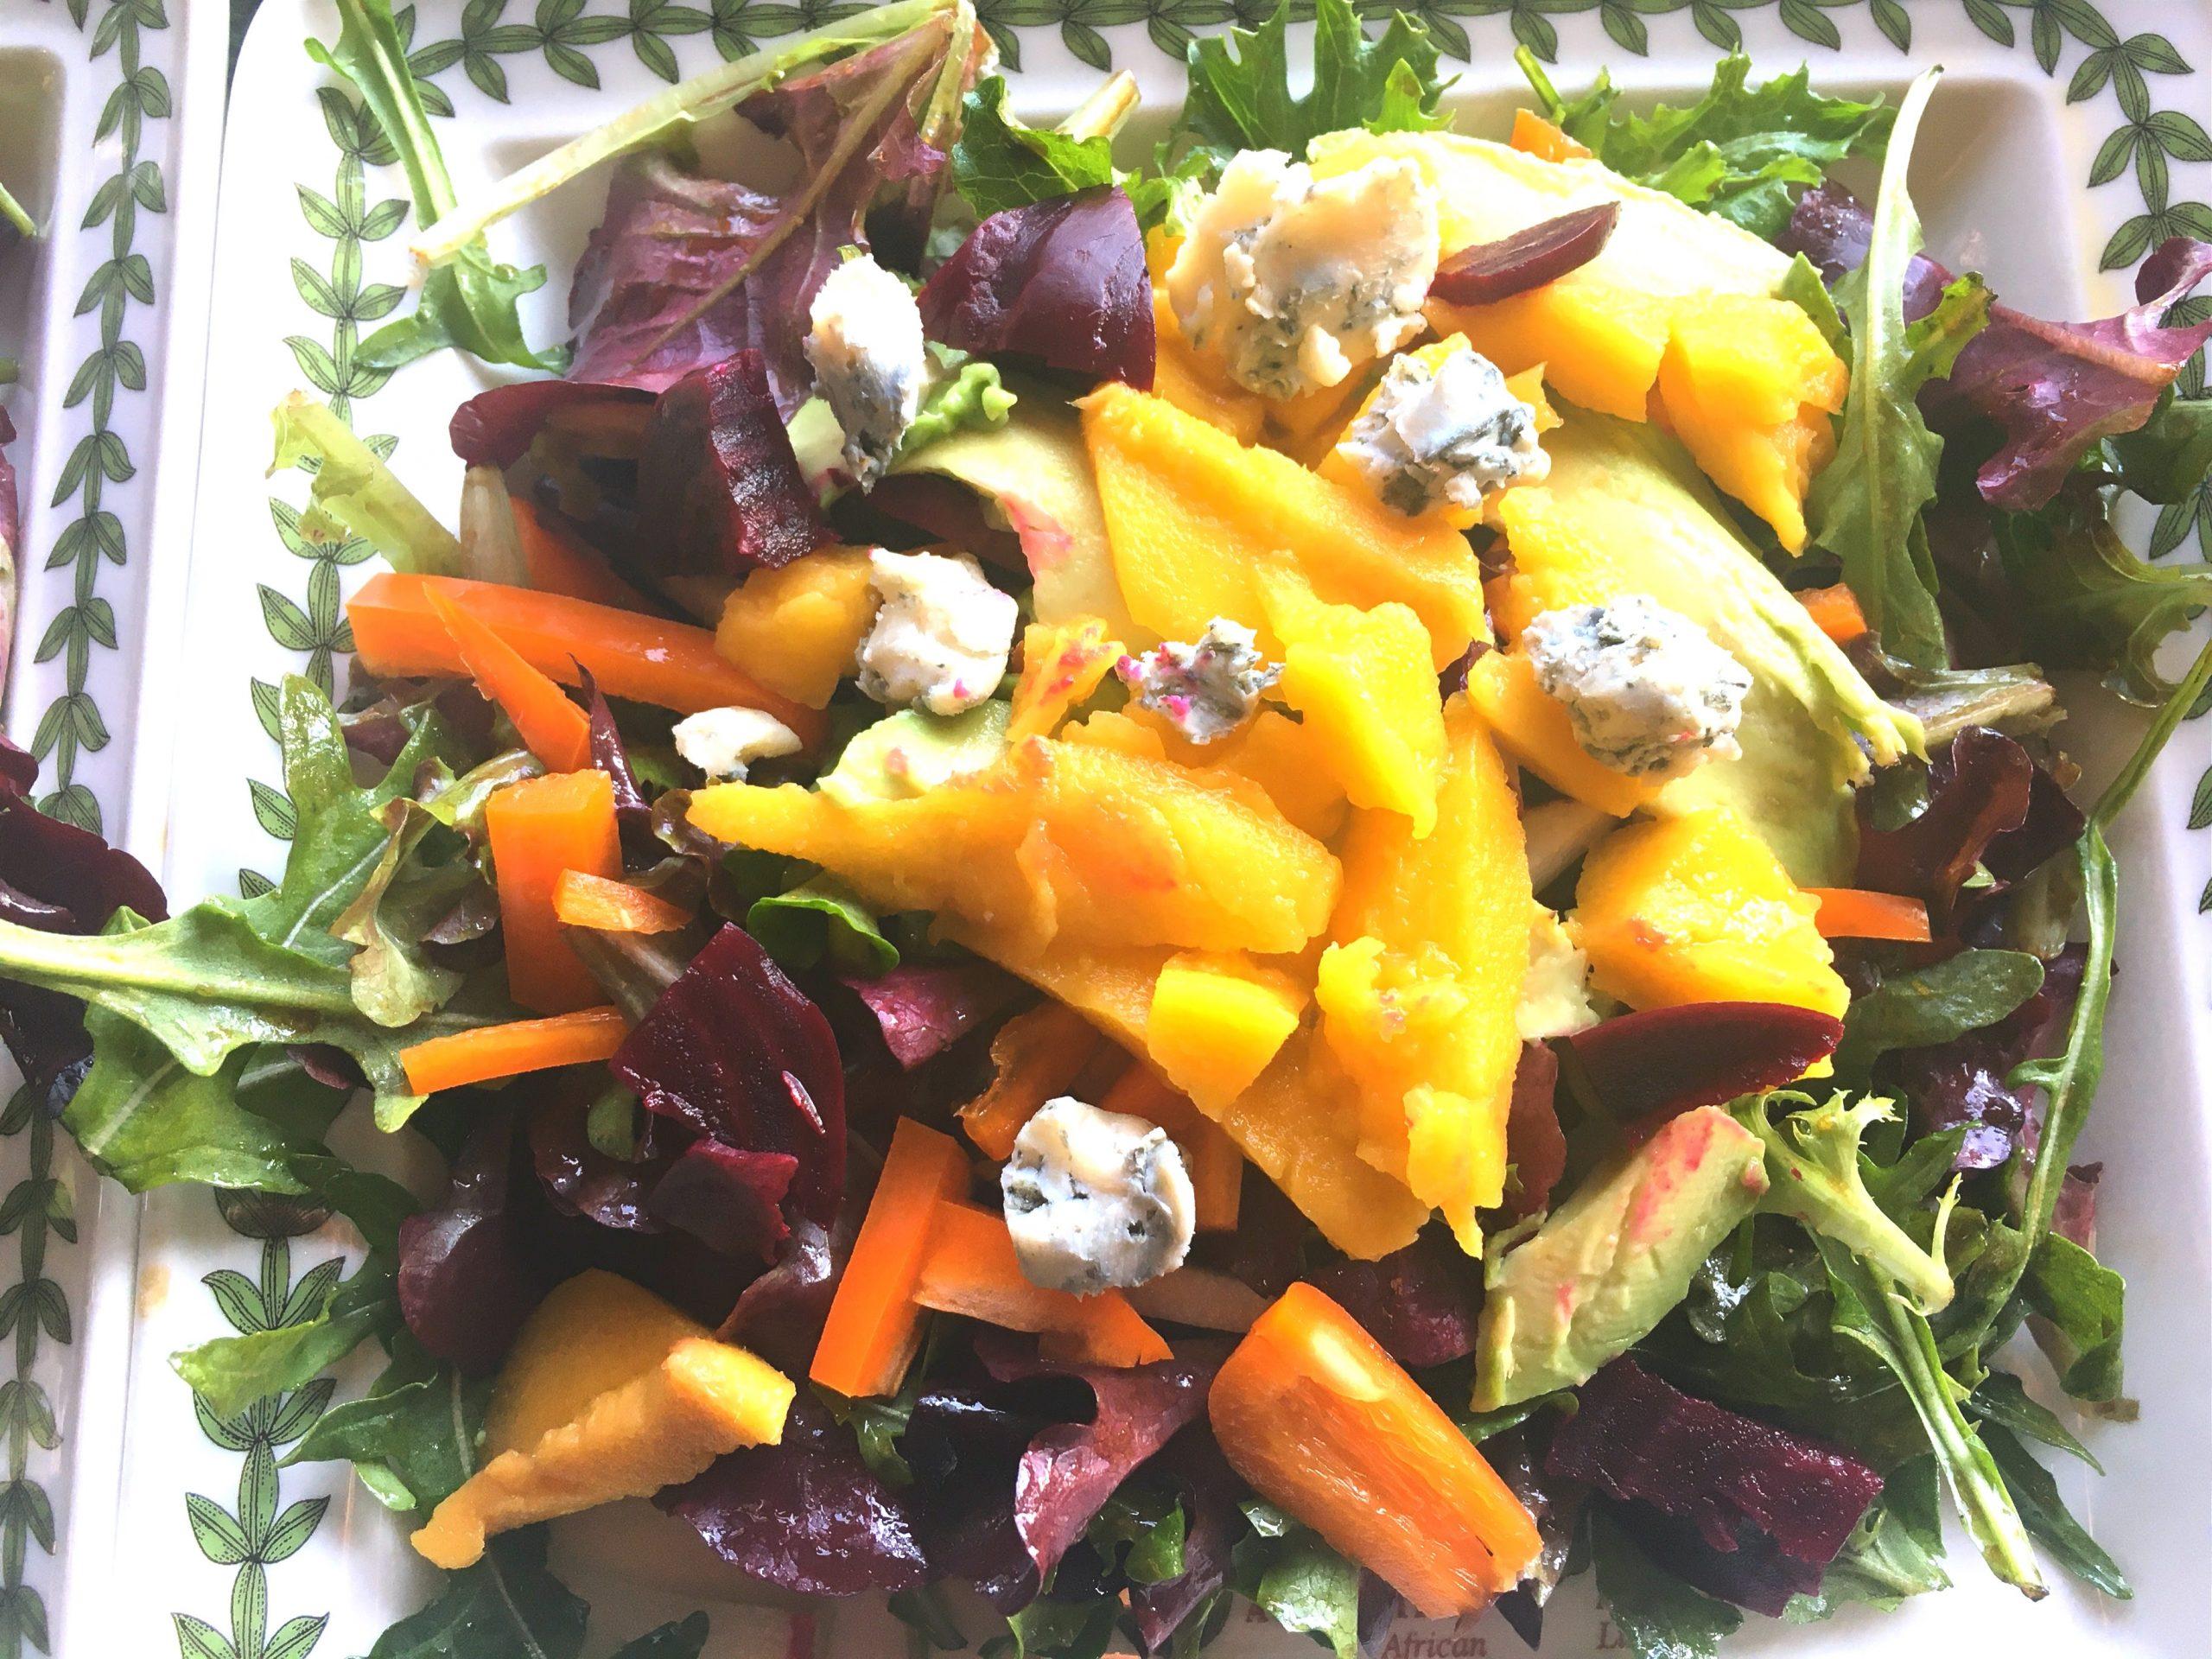 Mango, Beet, and Avocado Salad – serves 2 generously